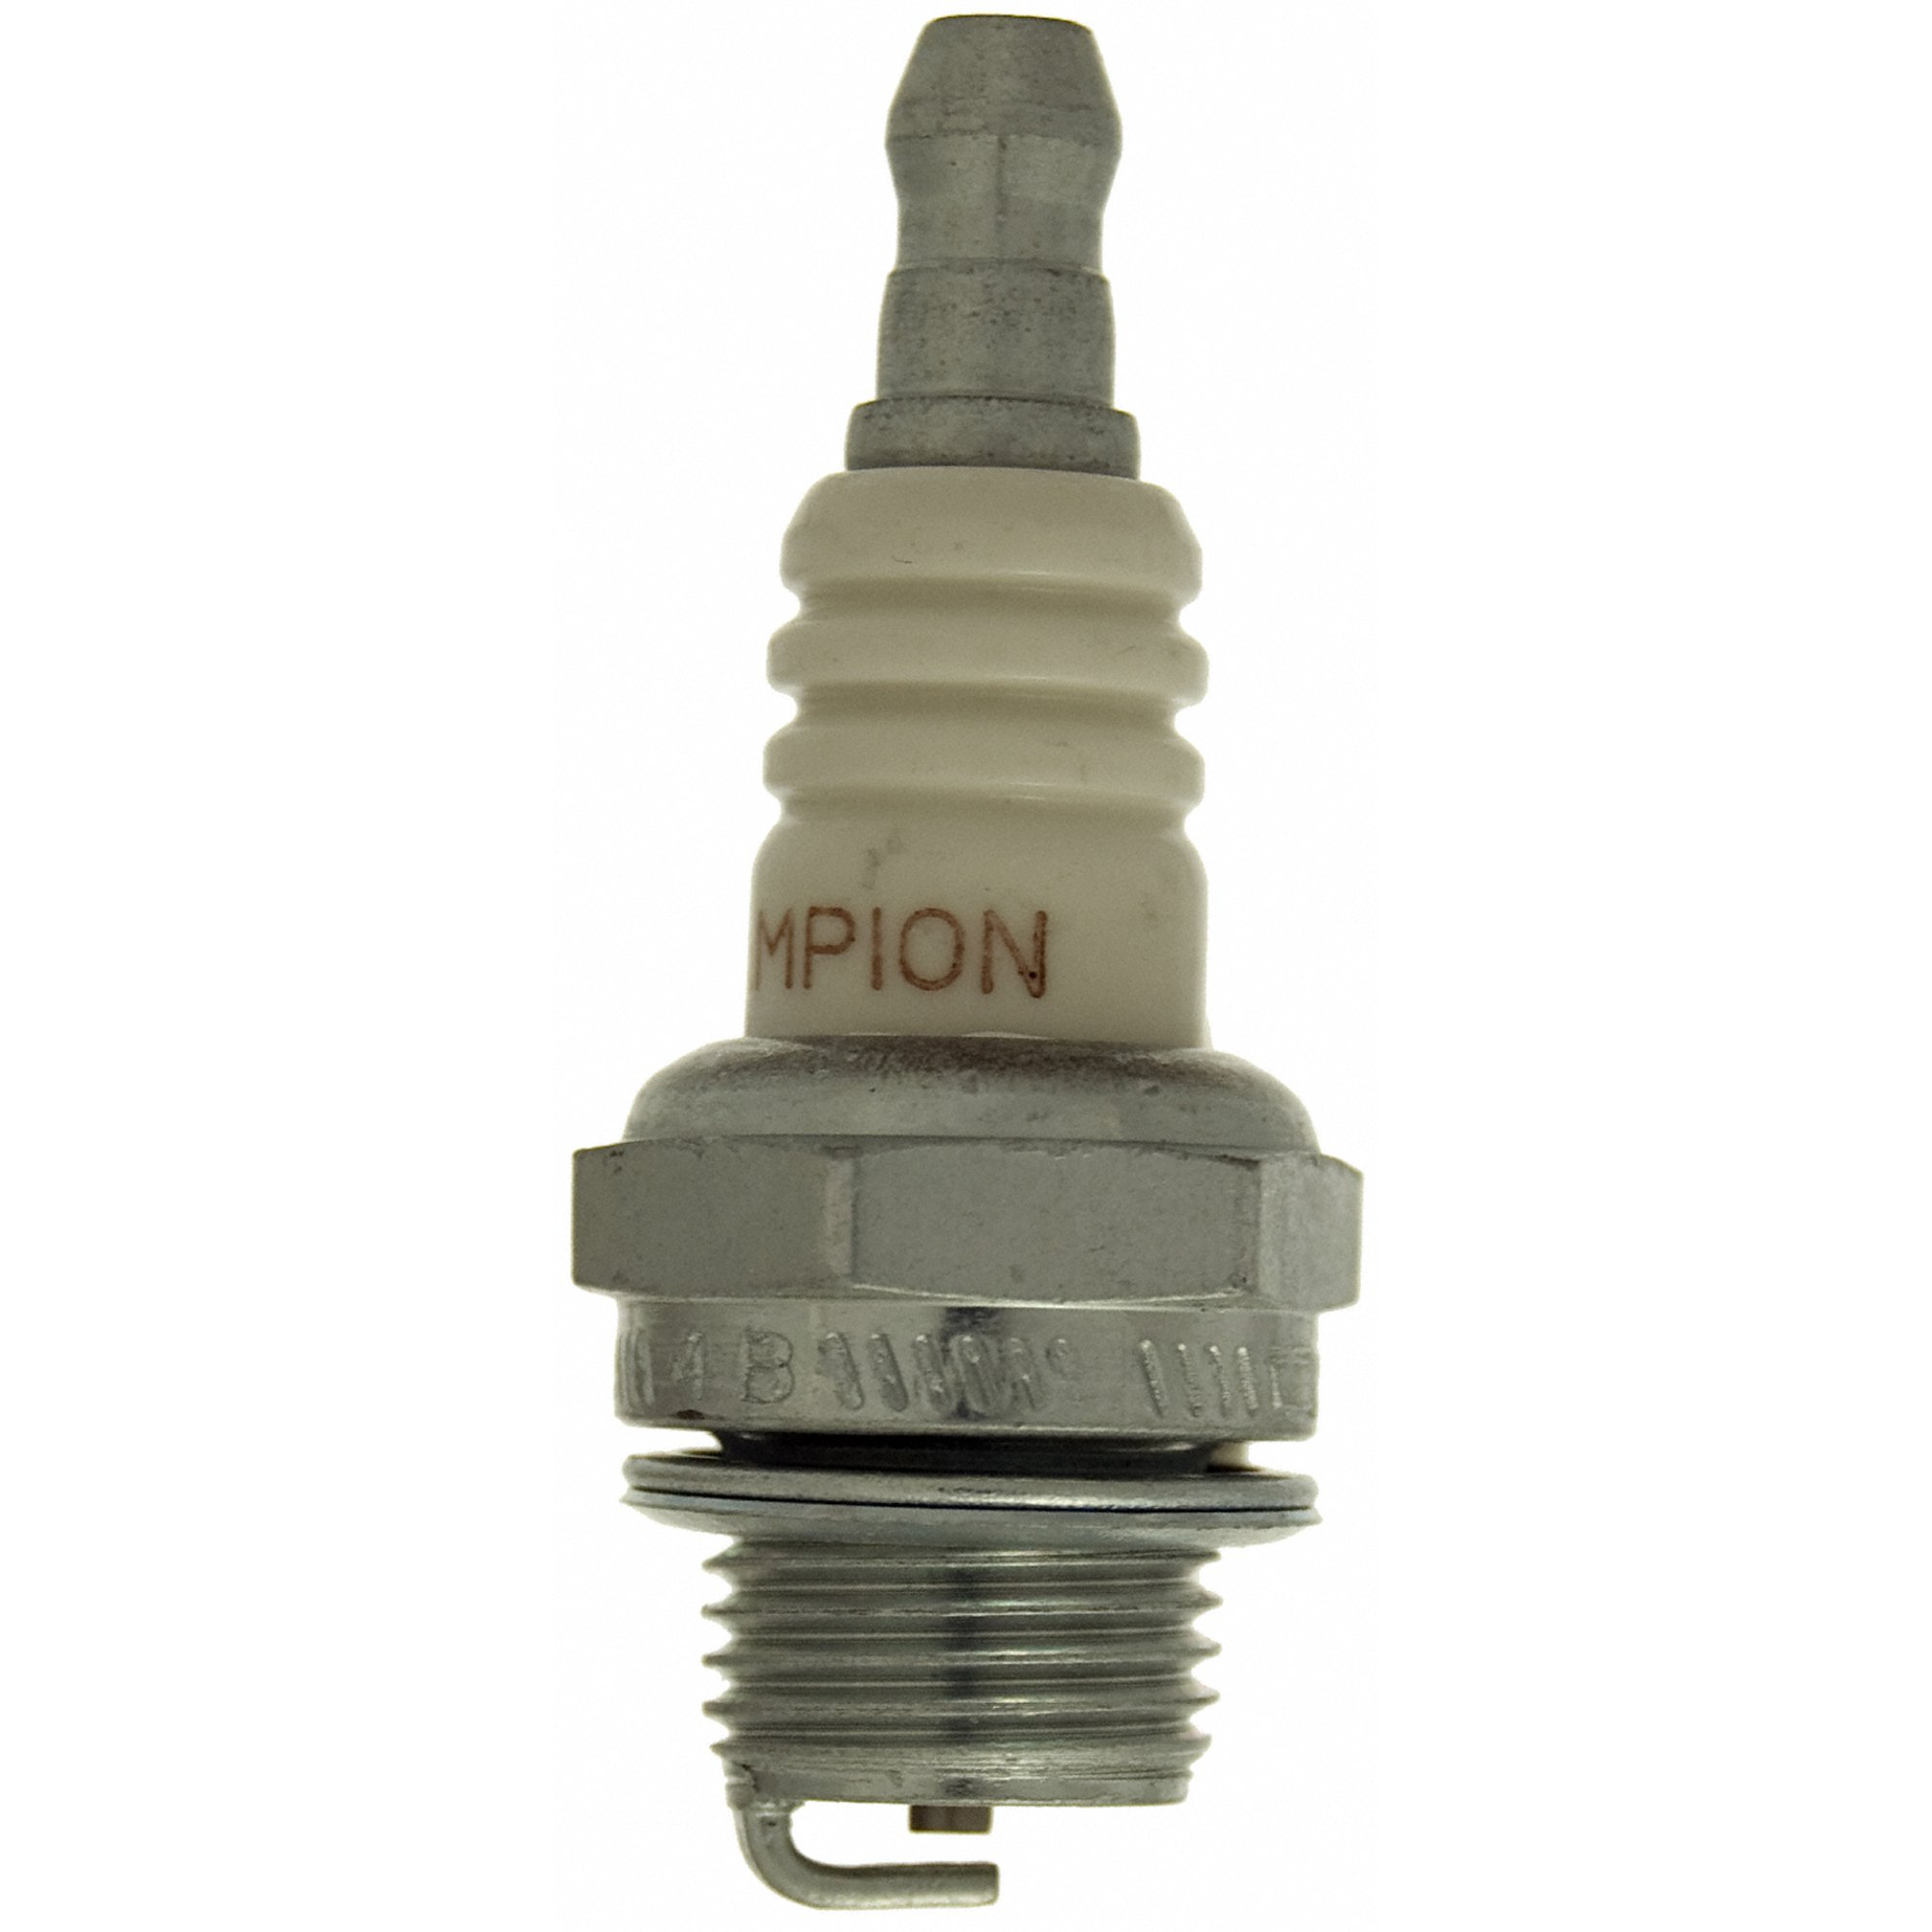 Pack of 1 Champion RH18Y 857 Copper Plus Small Engine Spark Plug